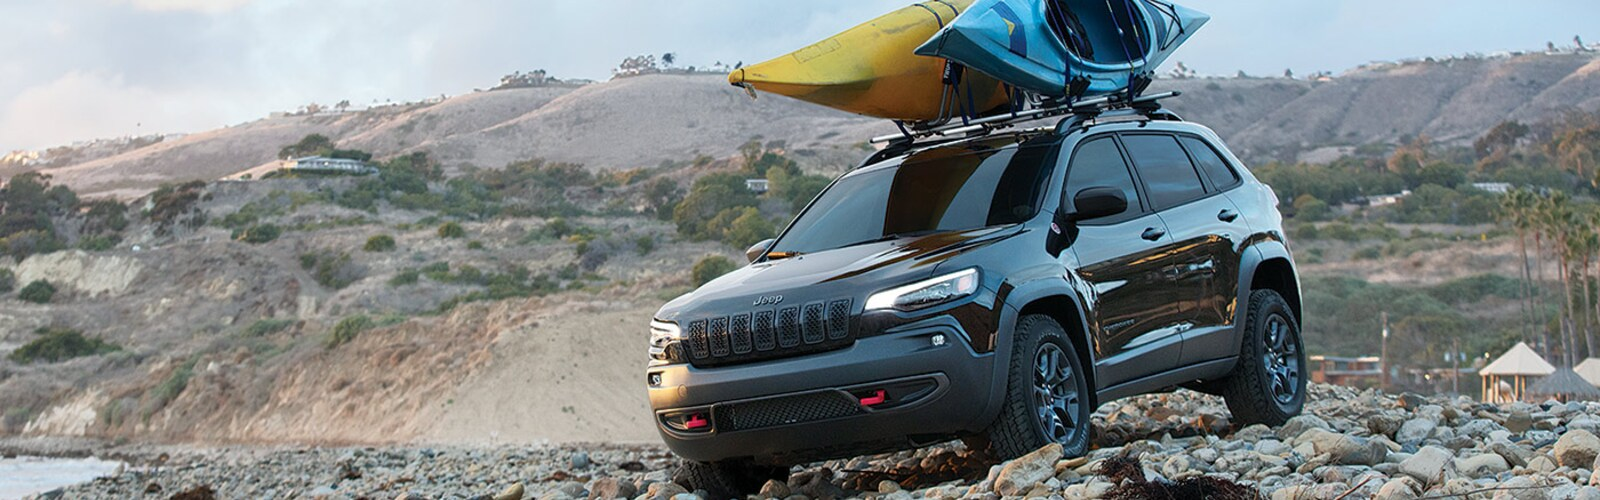 Landers Dodge Benton >> Landers Chrysler Dodge Jeep Ram FIAT | New Dodge, Jeep